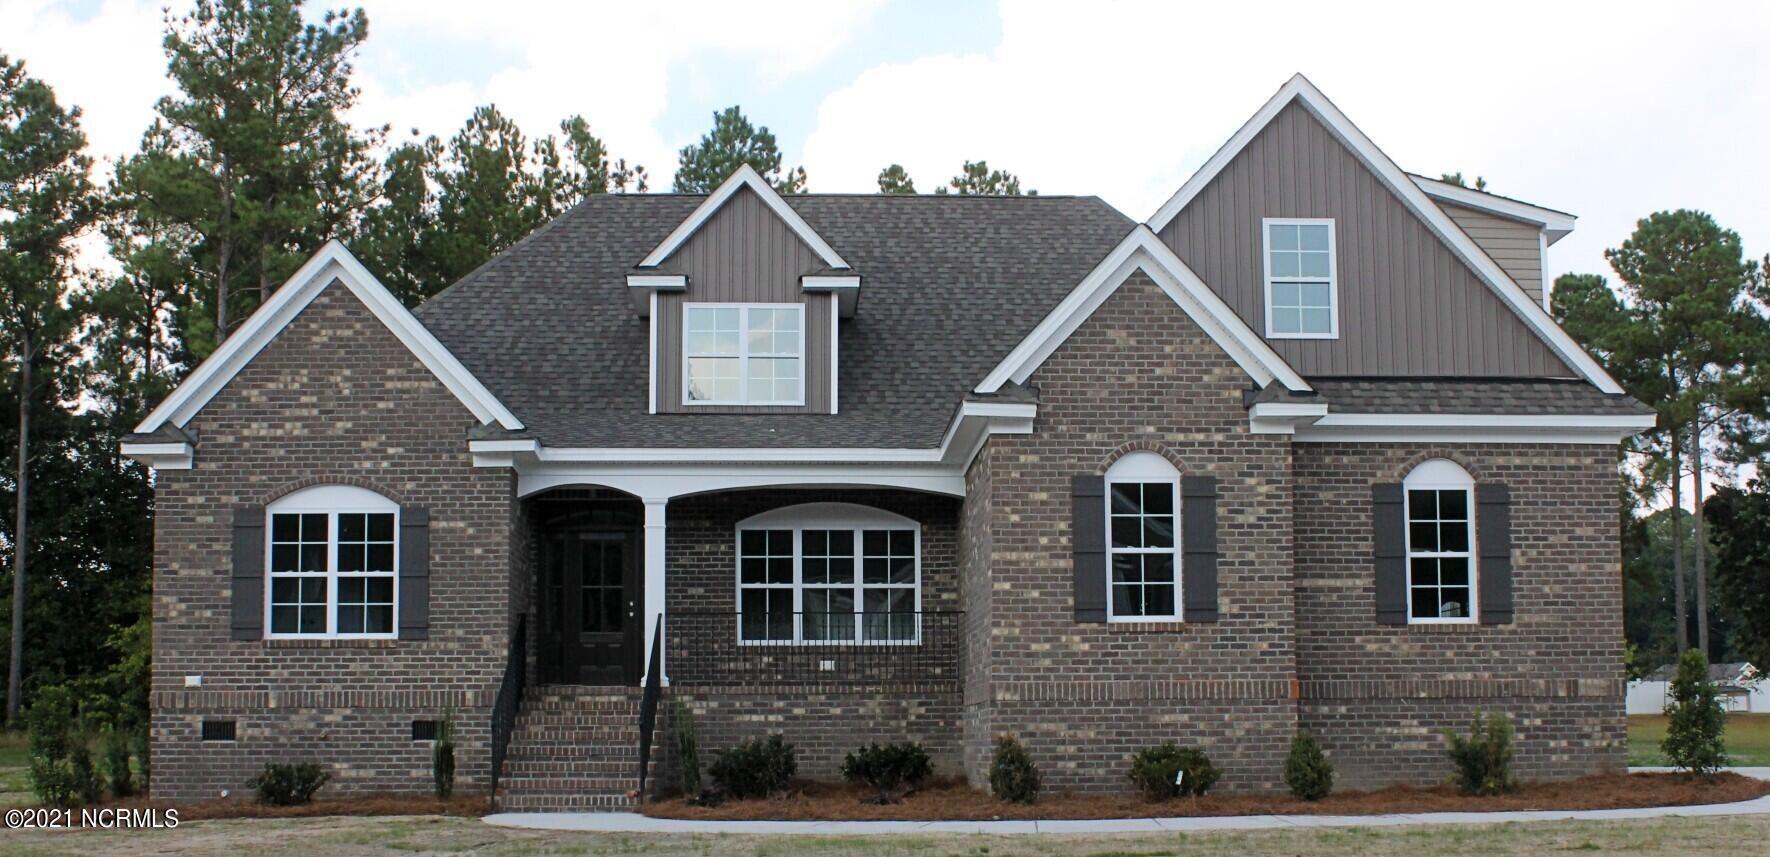 Photo of 1684 Blue Heron Drive, Nashville, NC 27856 (MLS # 100262708)